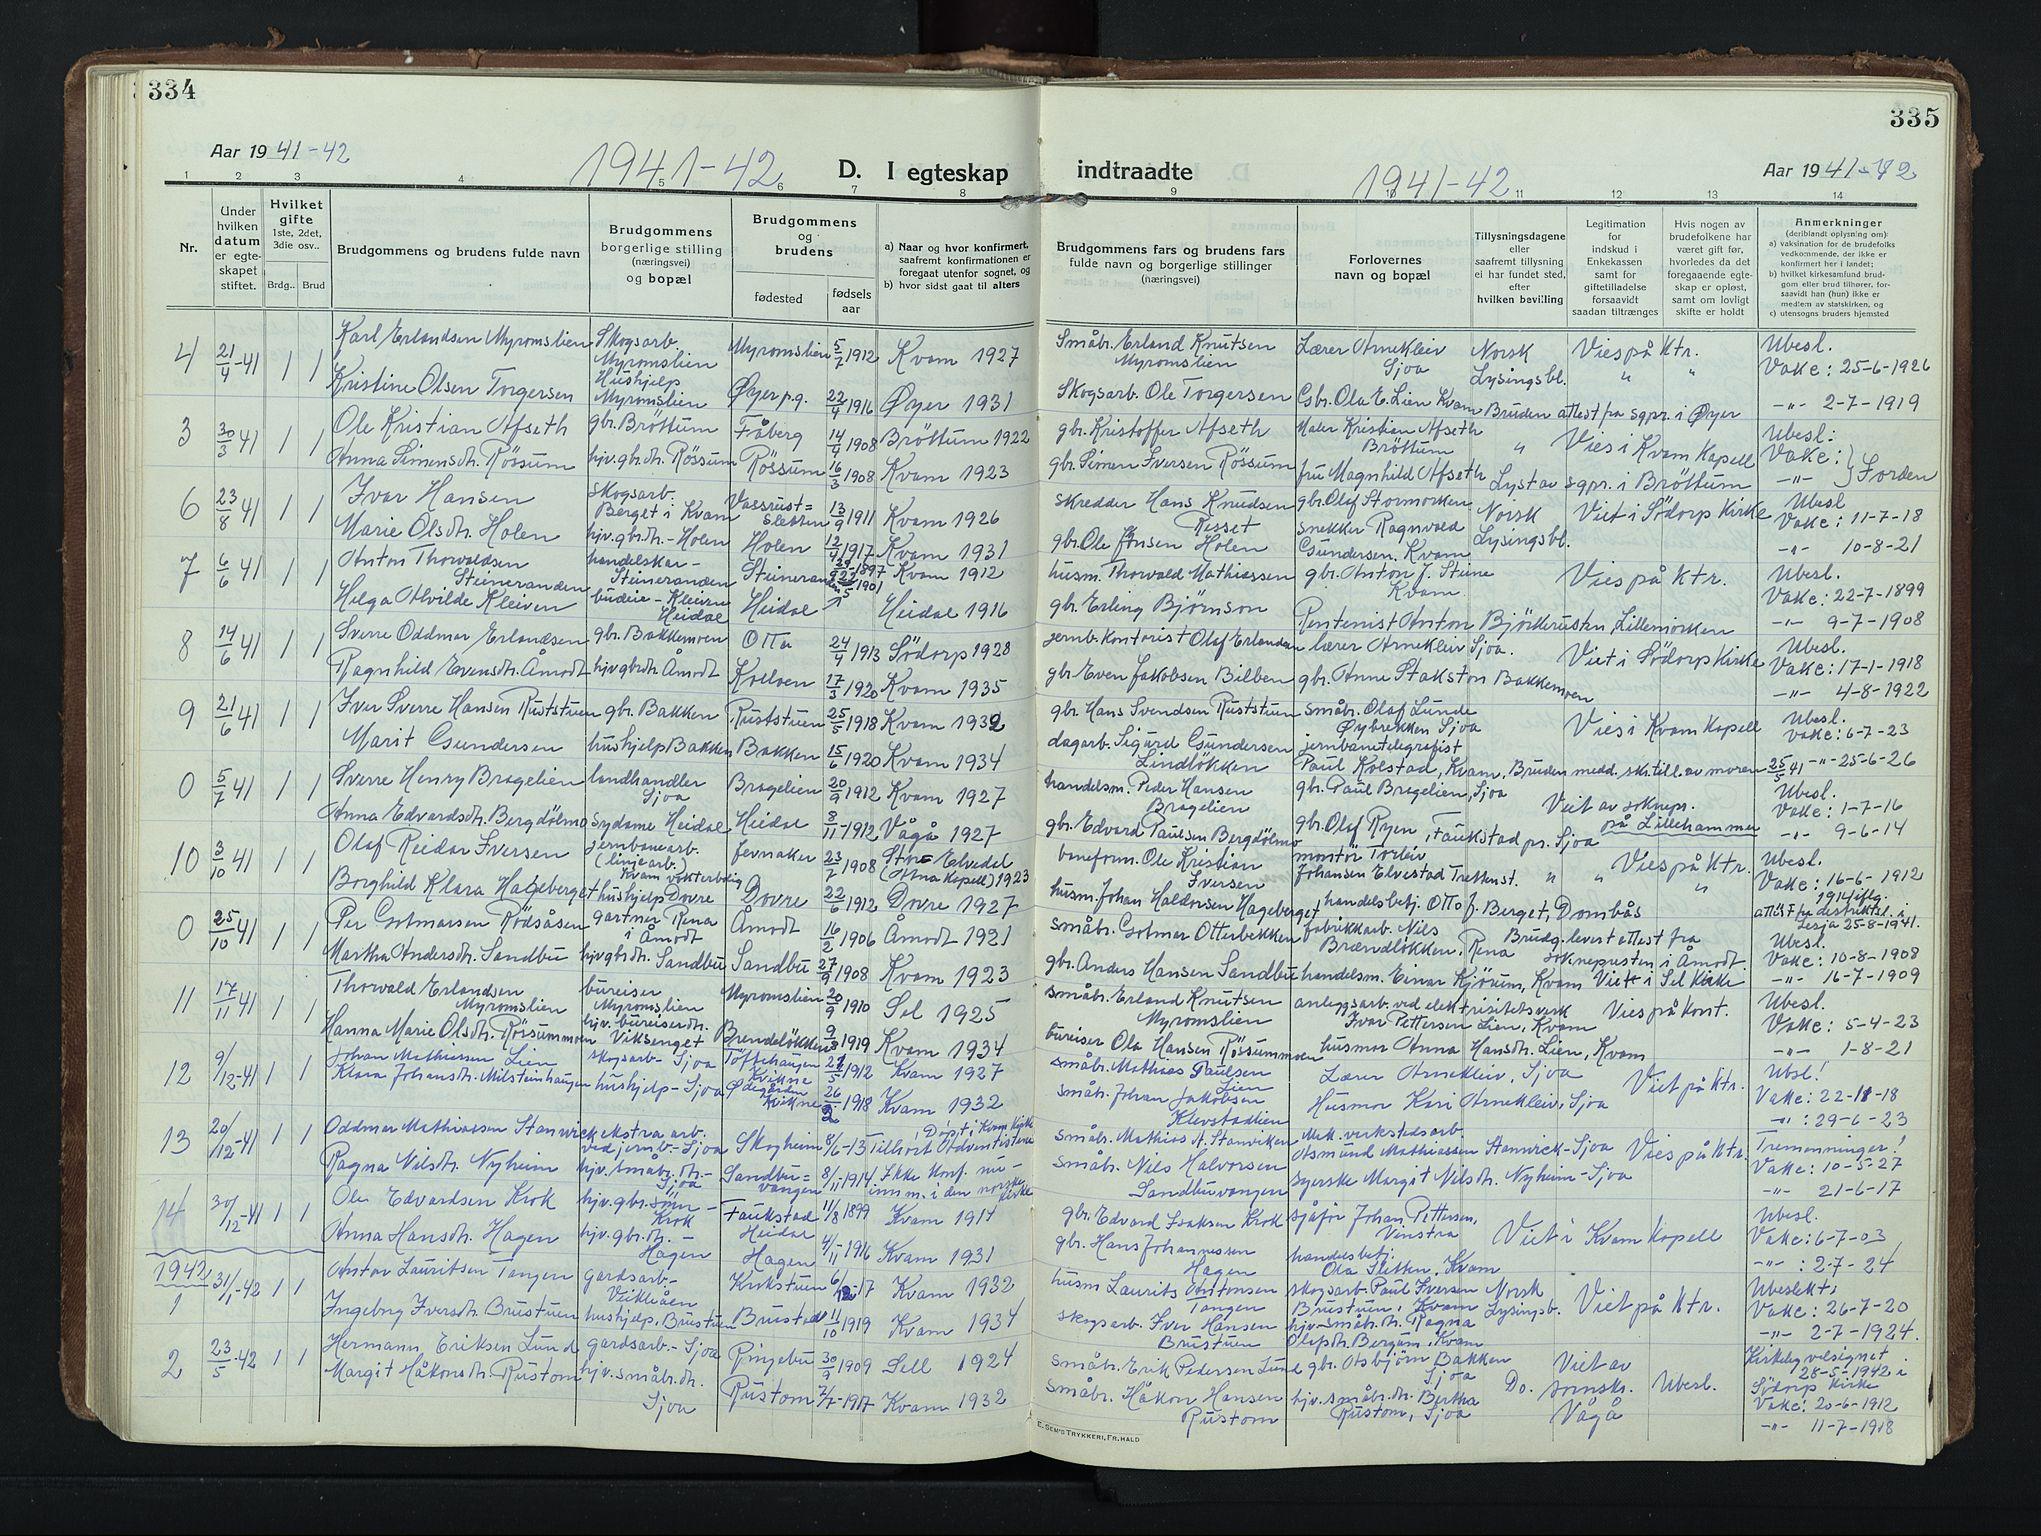 SAH, Nord-Fron prestekontor, Klokkerbok nr. 8, 1915-1948, s. 334-335